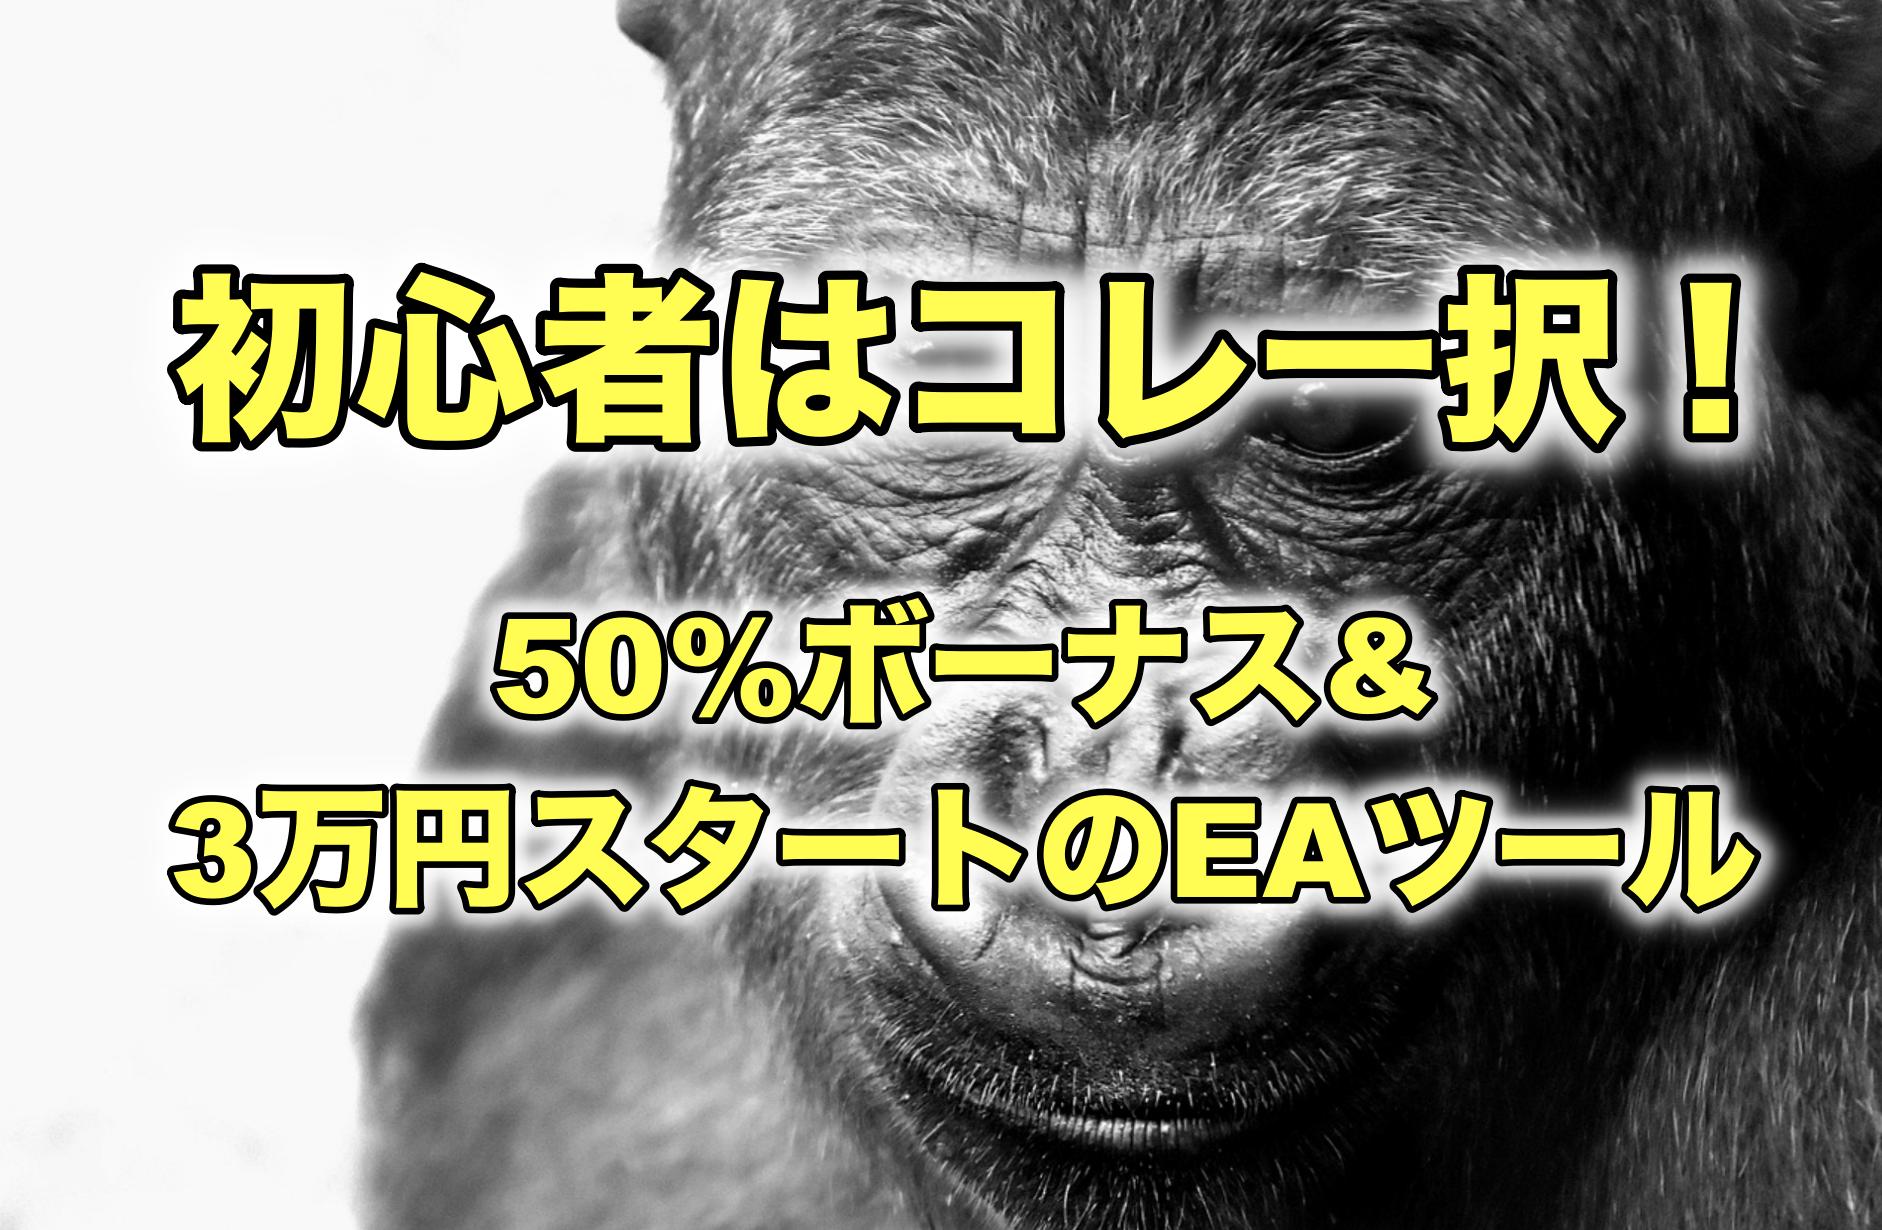 FX自動売買ツール初心者はゴリラEA一択な件【50%の入金ボーナス付き?】